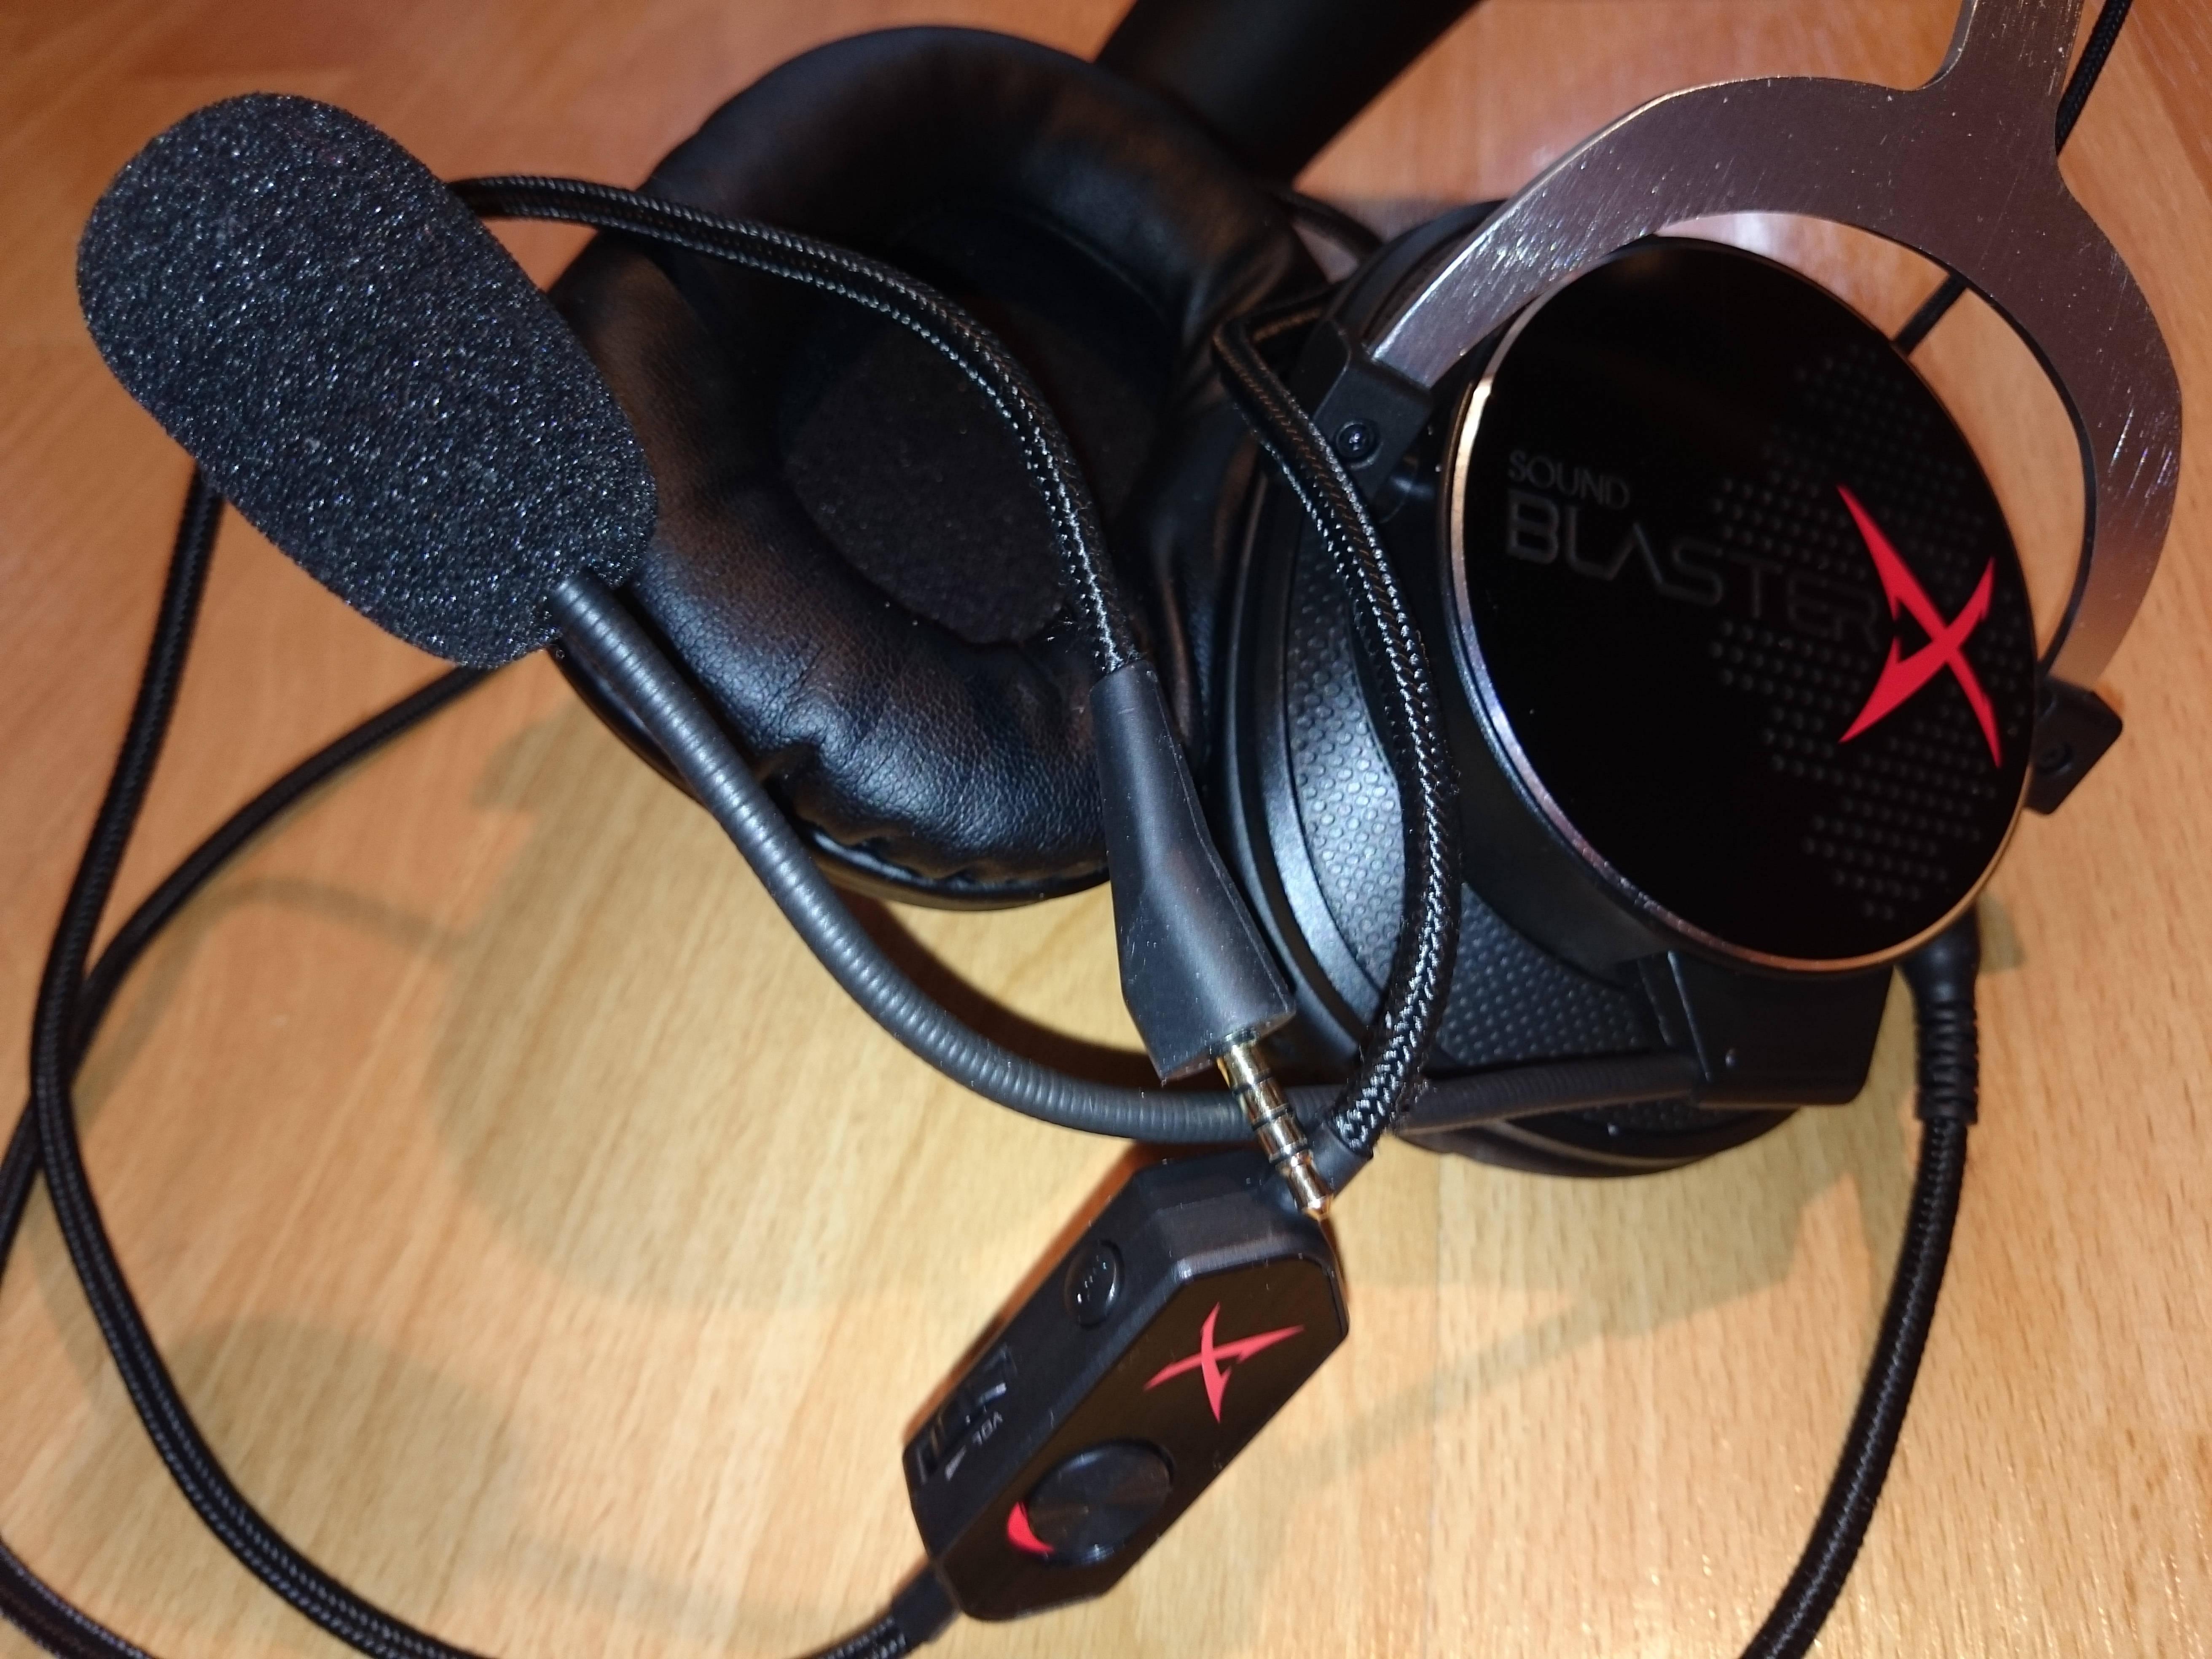 f15c31f24 Creative Sound BlasterX H5 - hardvérový test / recenzia | Sector